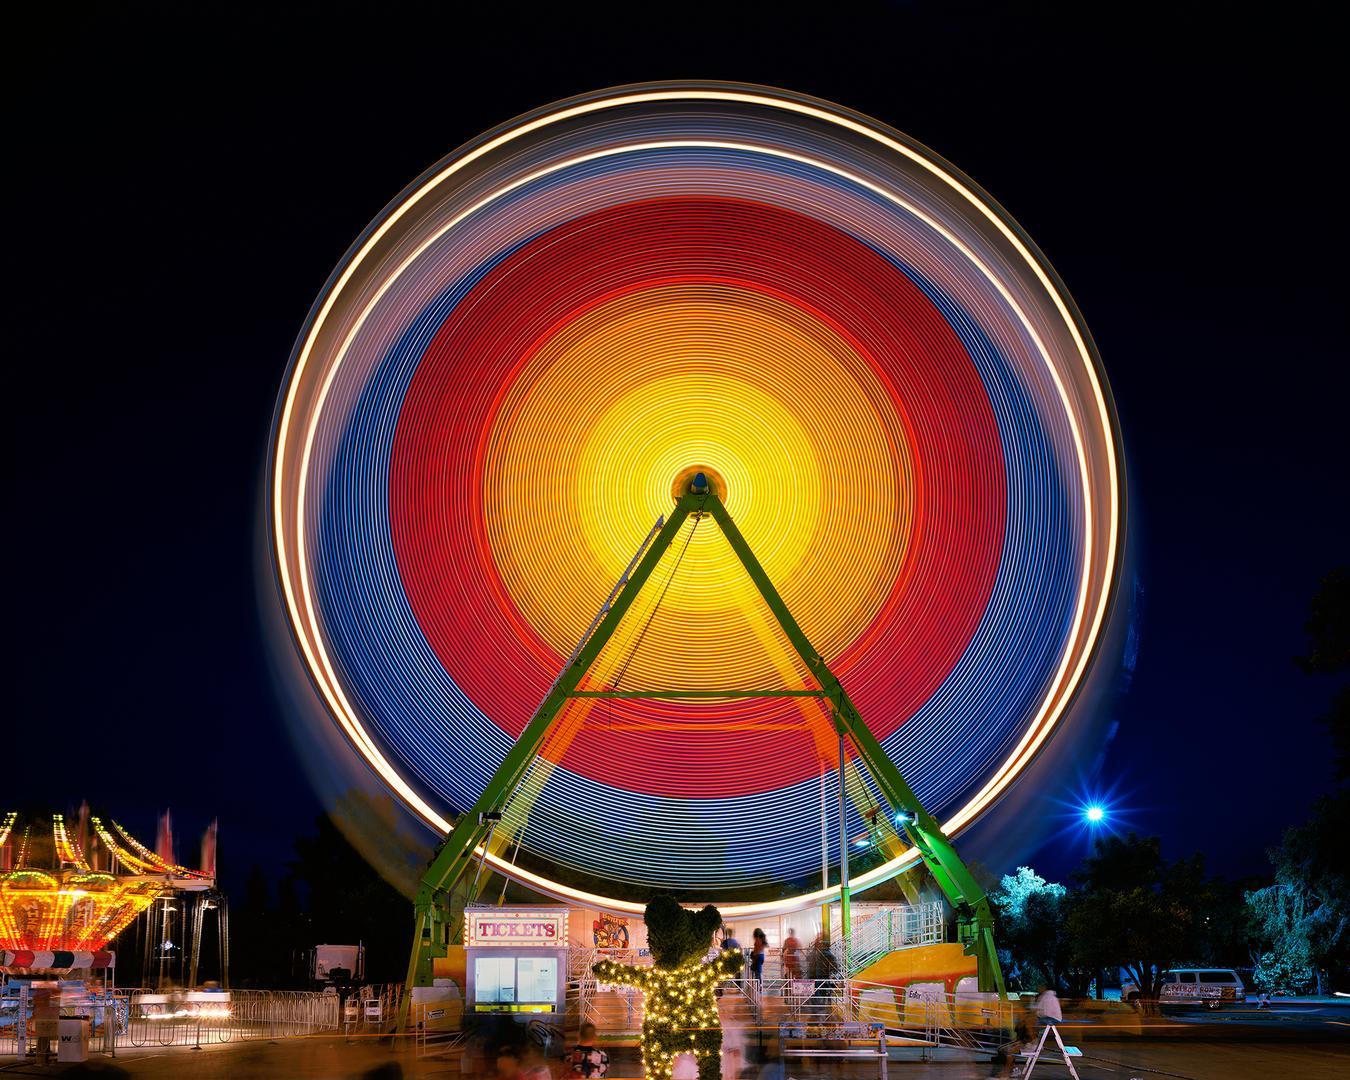 Vail_Giant_Wheel0